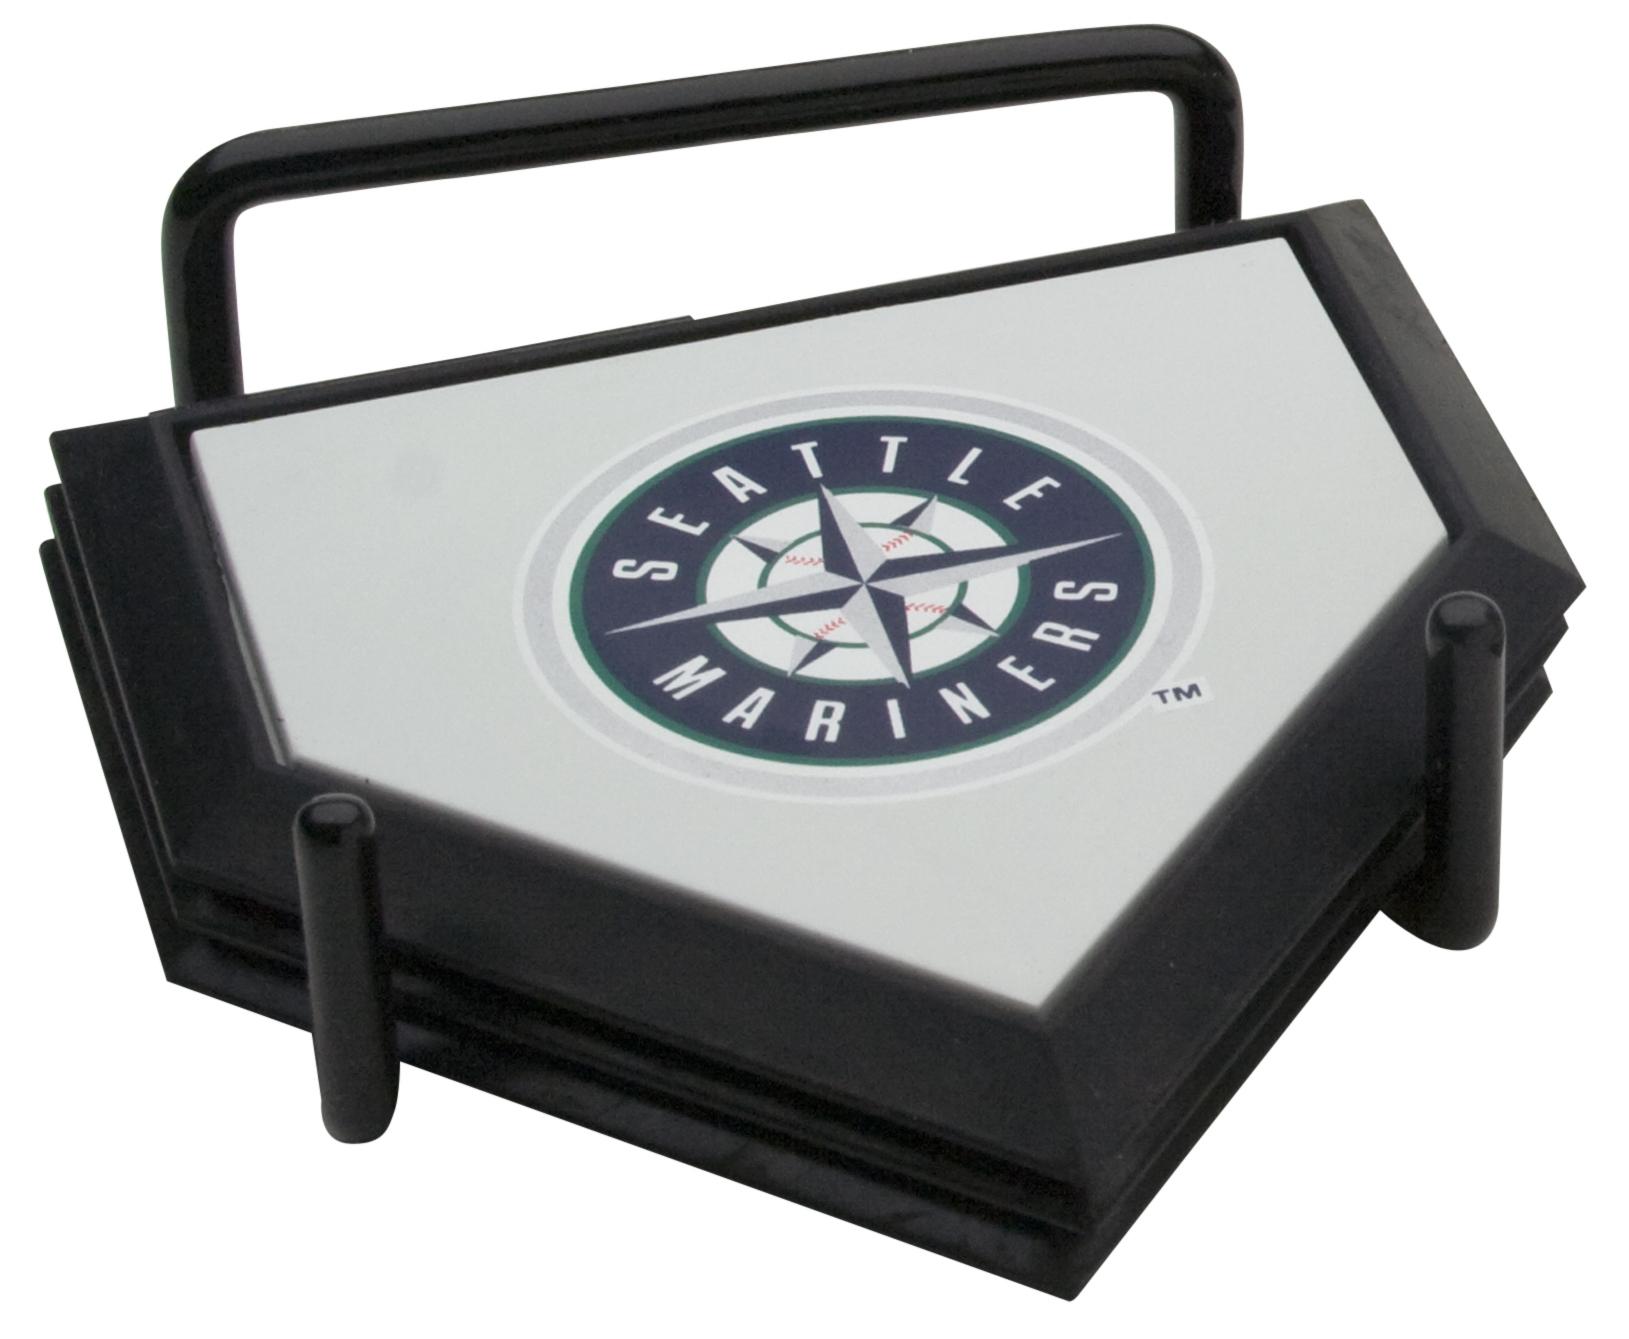 Seattle Mariners Coaster Set MLB